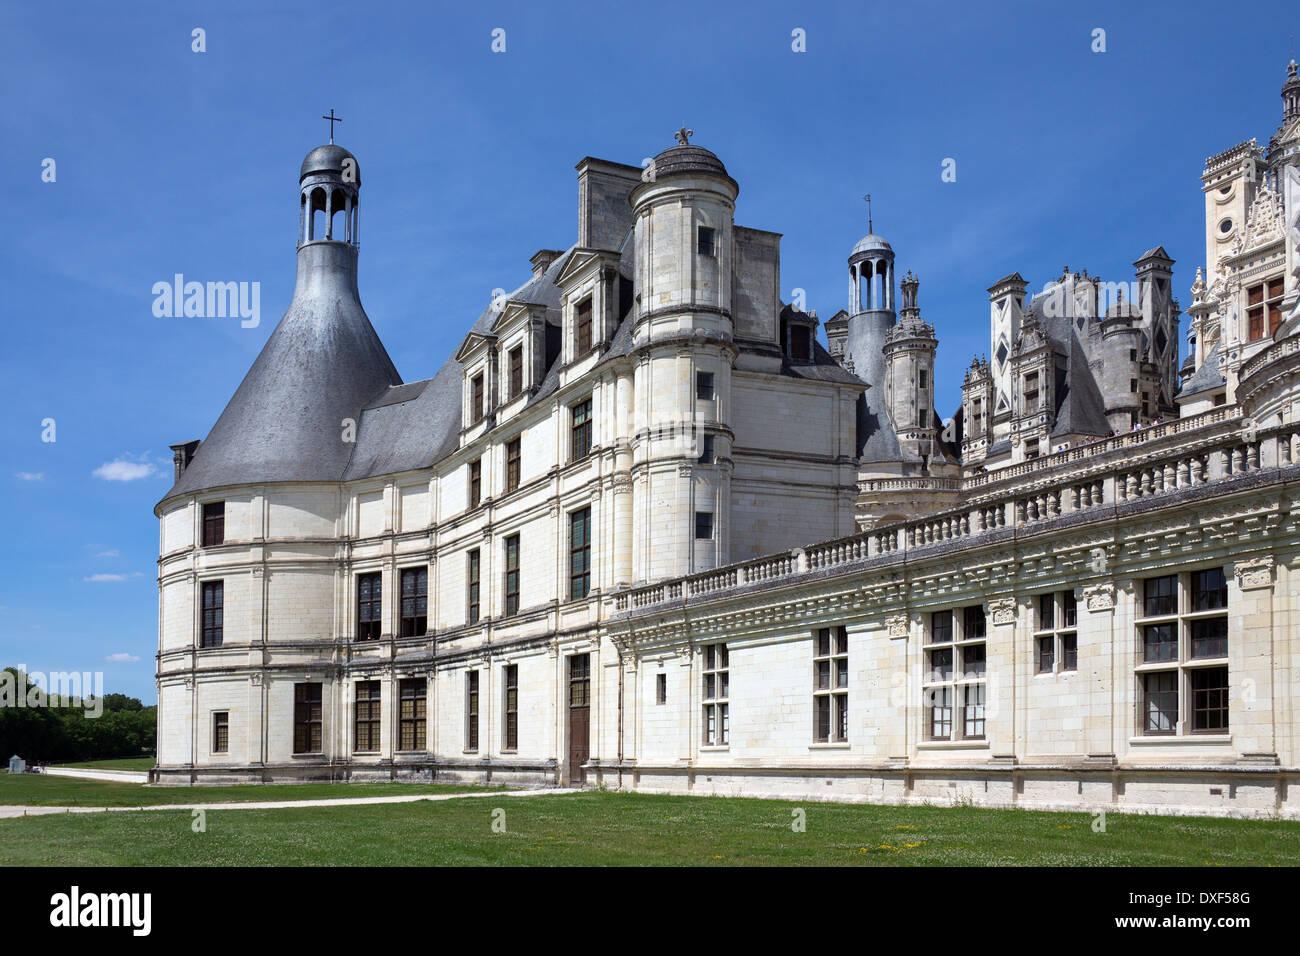 Chateau de Chambord - Loire Valley - France - Stock Image